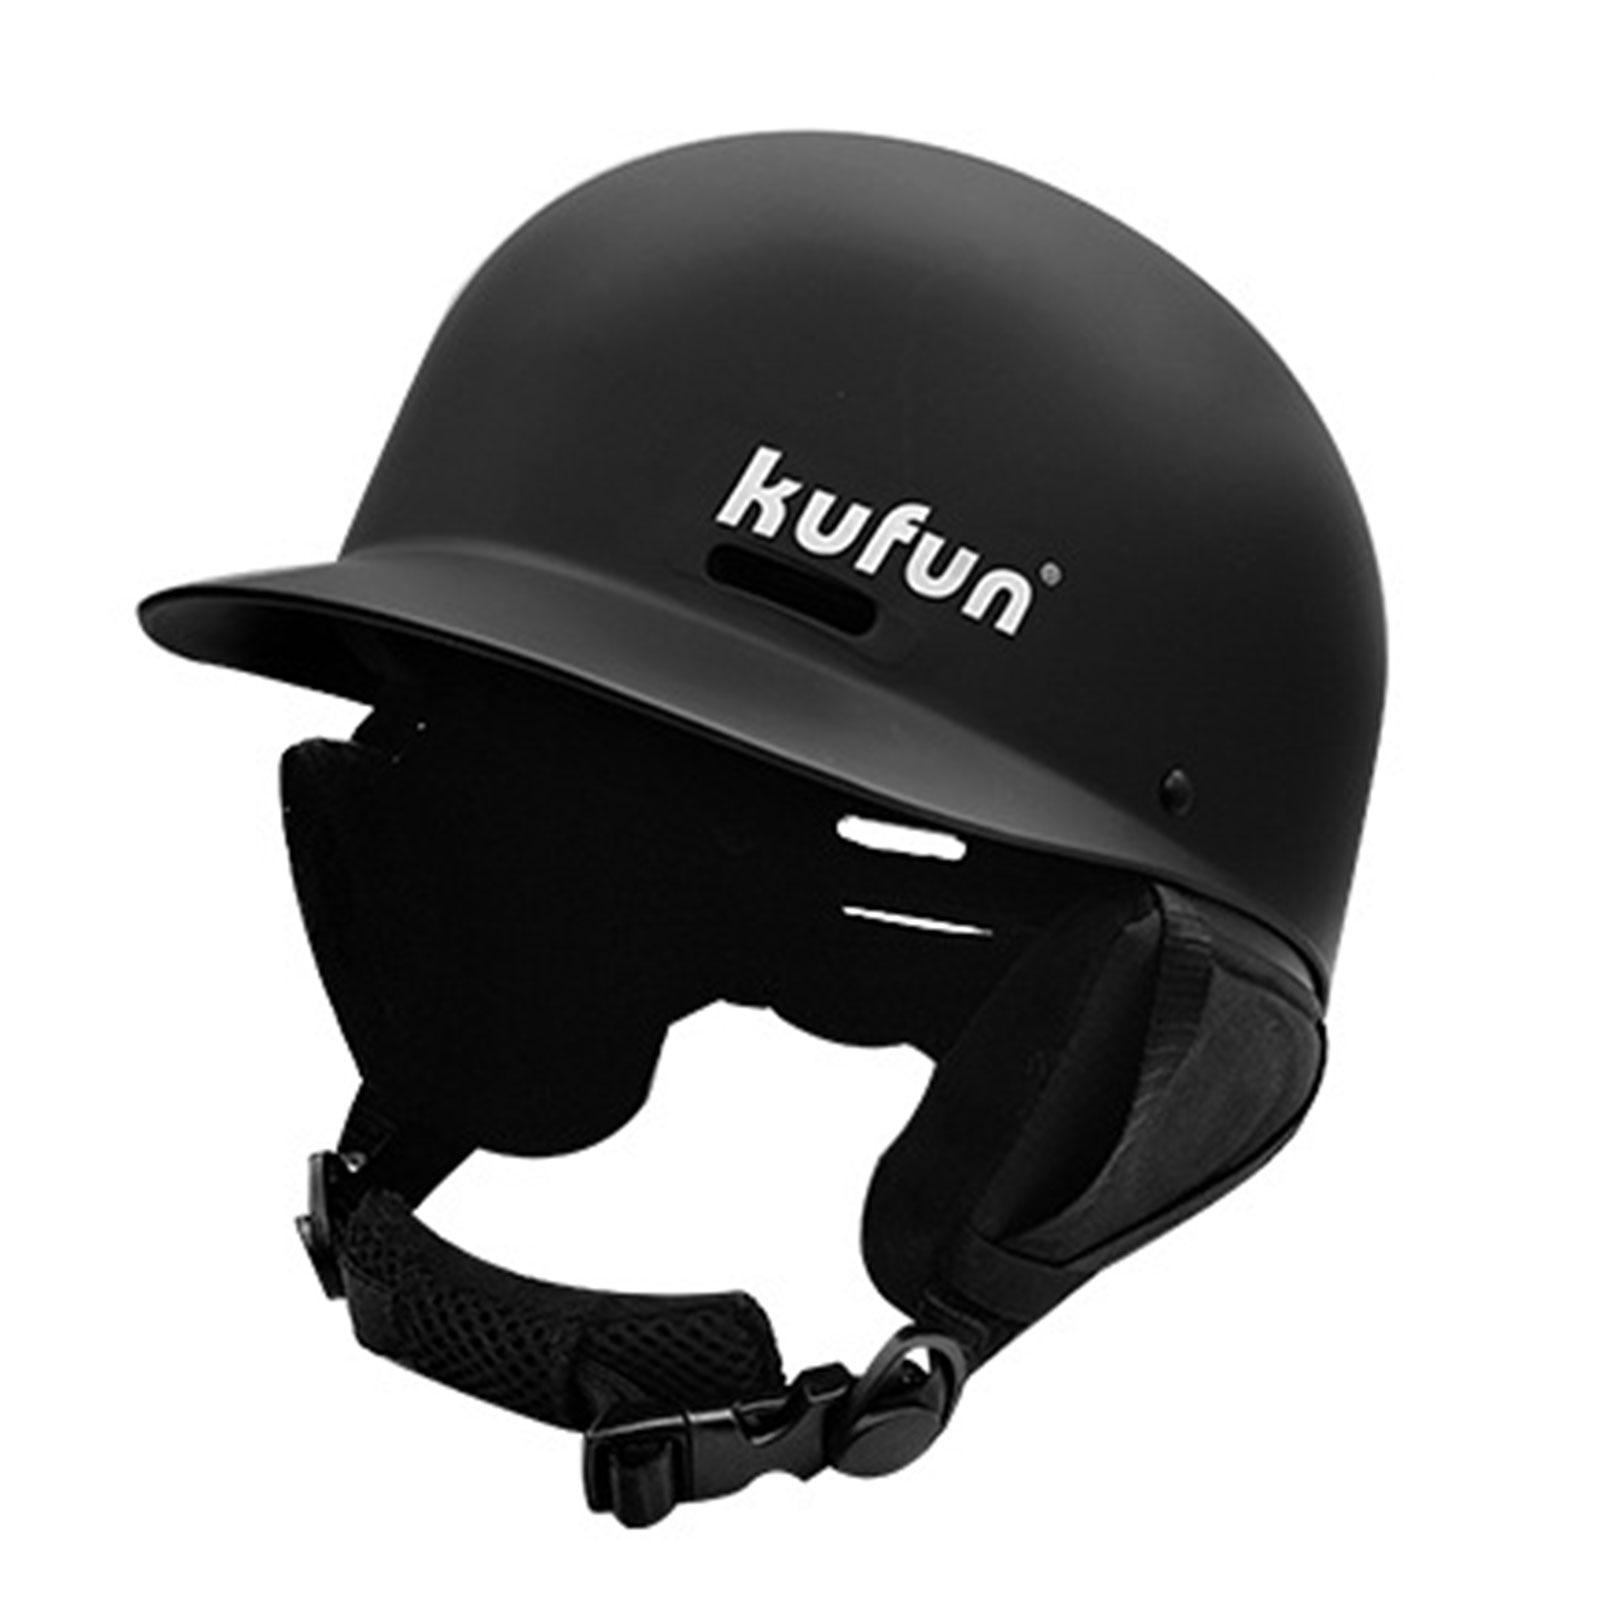 Winter Adult Ski Helmet Adult Snowboard Helmet Sports Safety Integrally-Molded Skiing Snow Helmet With Detachable Earmuffs